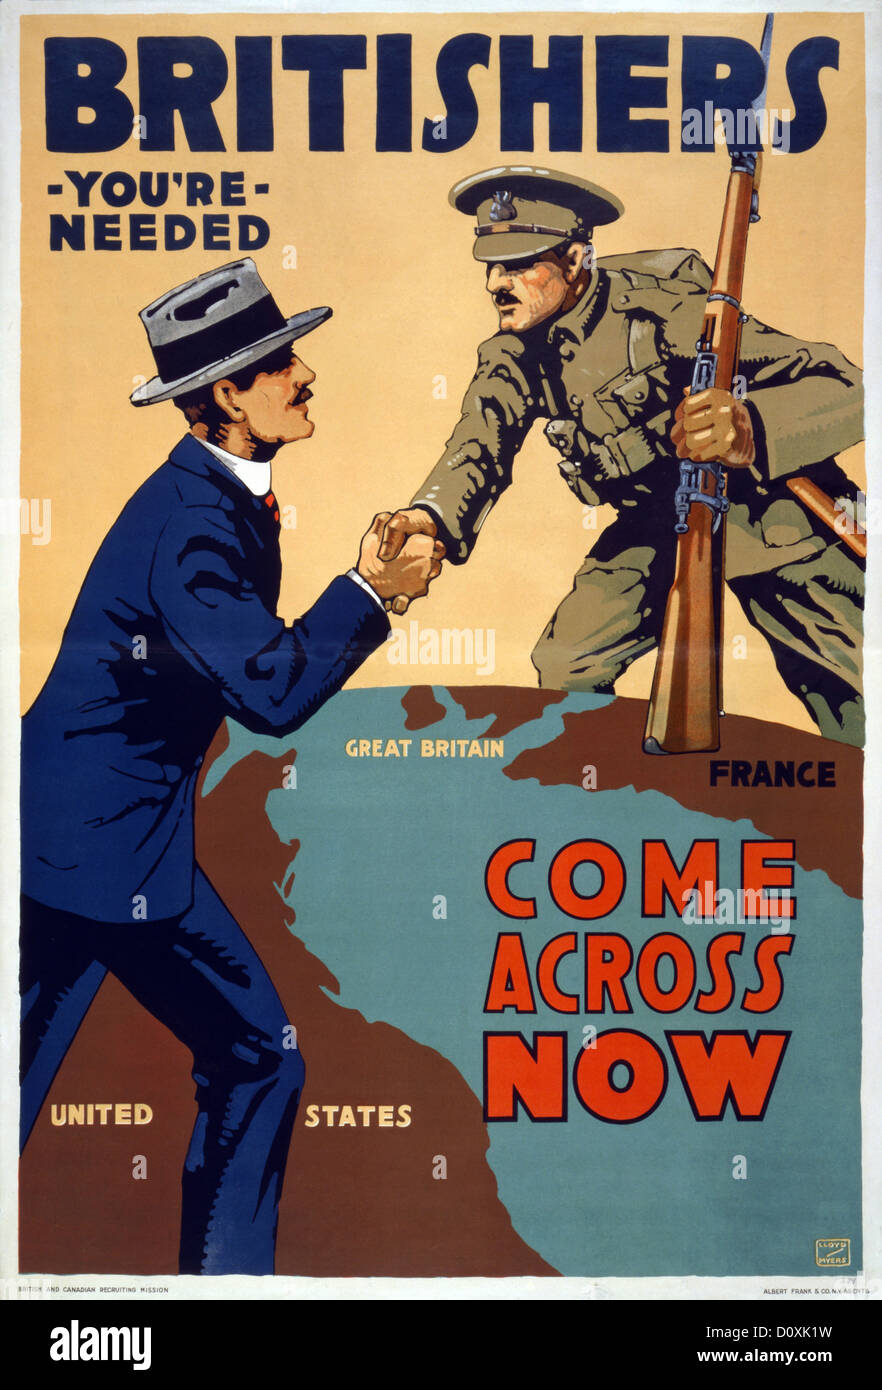 World War I, American, recruitment, poster, men, globe, shaking hands, Atlantic;, Great Britain, France, Recruiting, - Stock Image